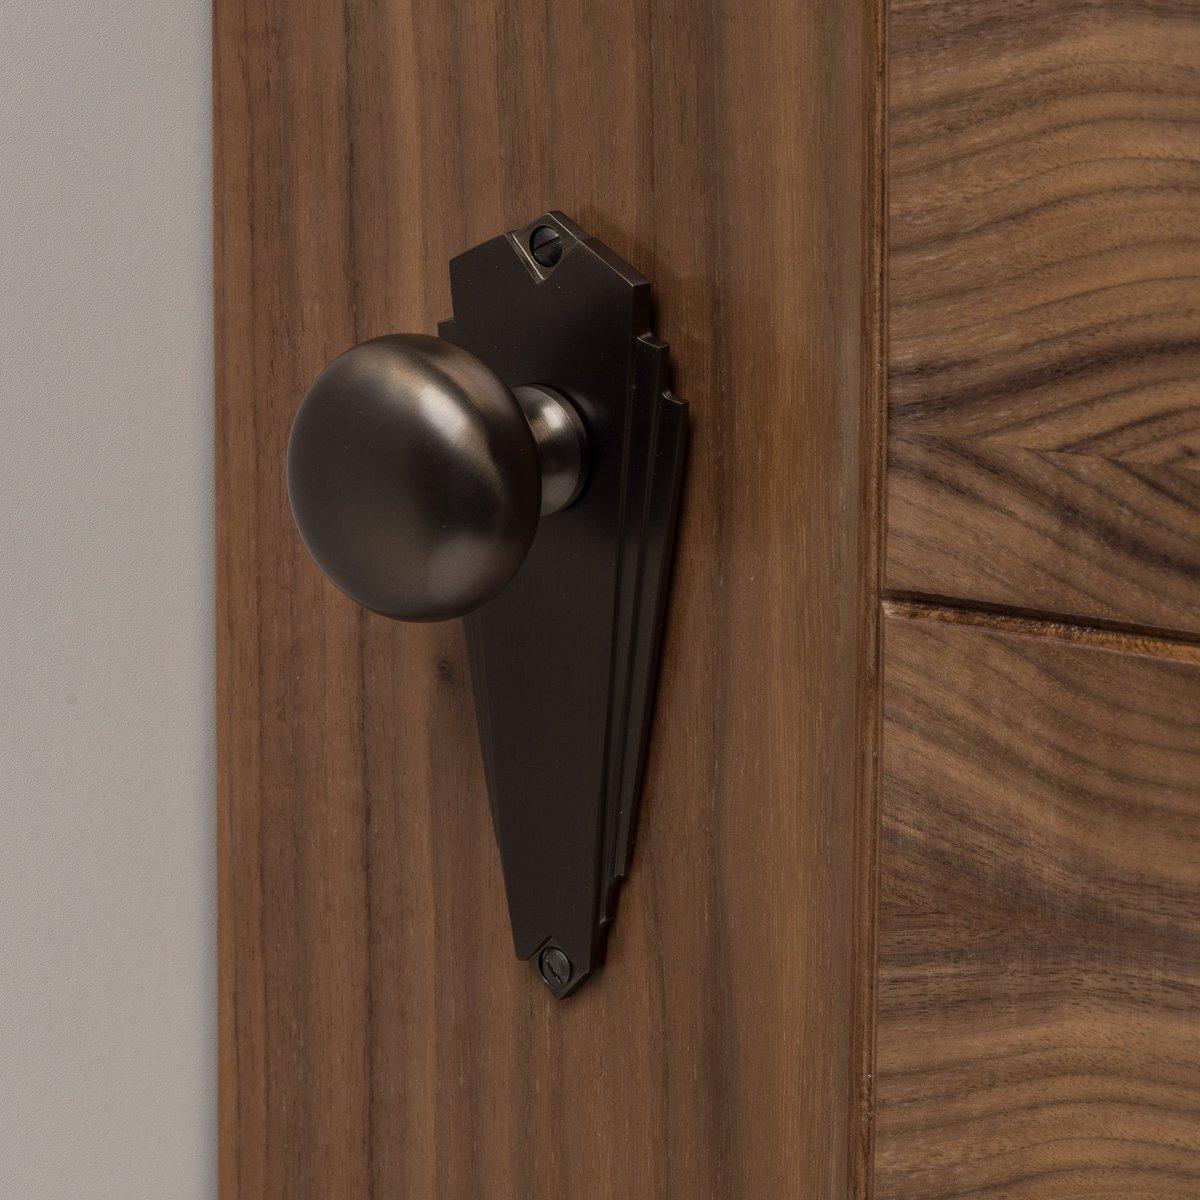 Handles4u On Twitter Love These Solid Brass Art Deco Style Door Knobs From Heritagebrass Showcased Here In The Matt Bronze Finish Stunning Uplift For Any Door Interiordesign Interiordecor Doors Knobs Solidbrass Artdeco